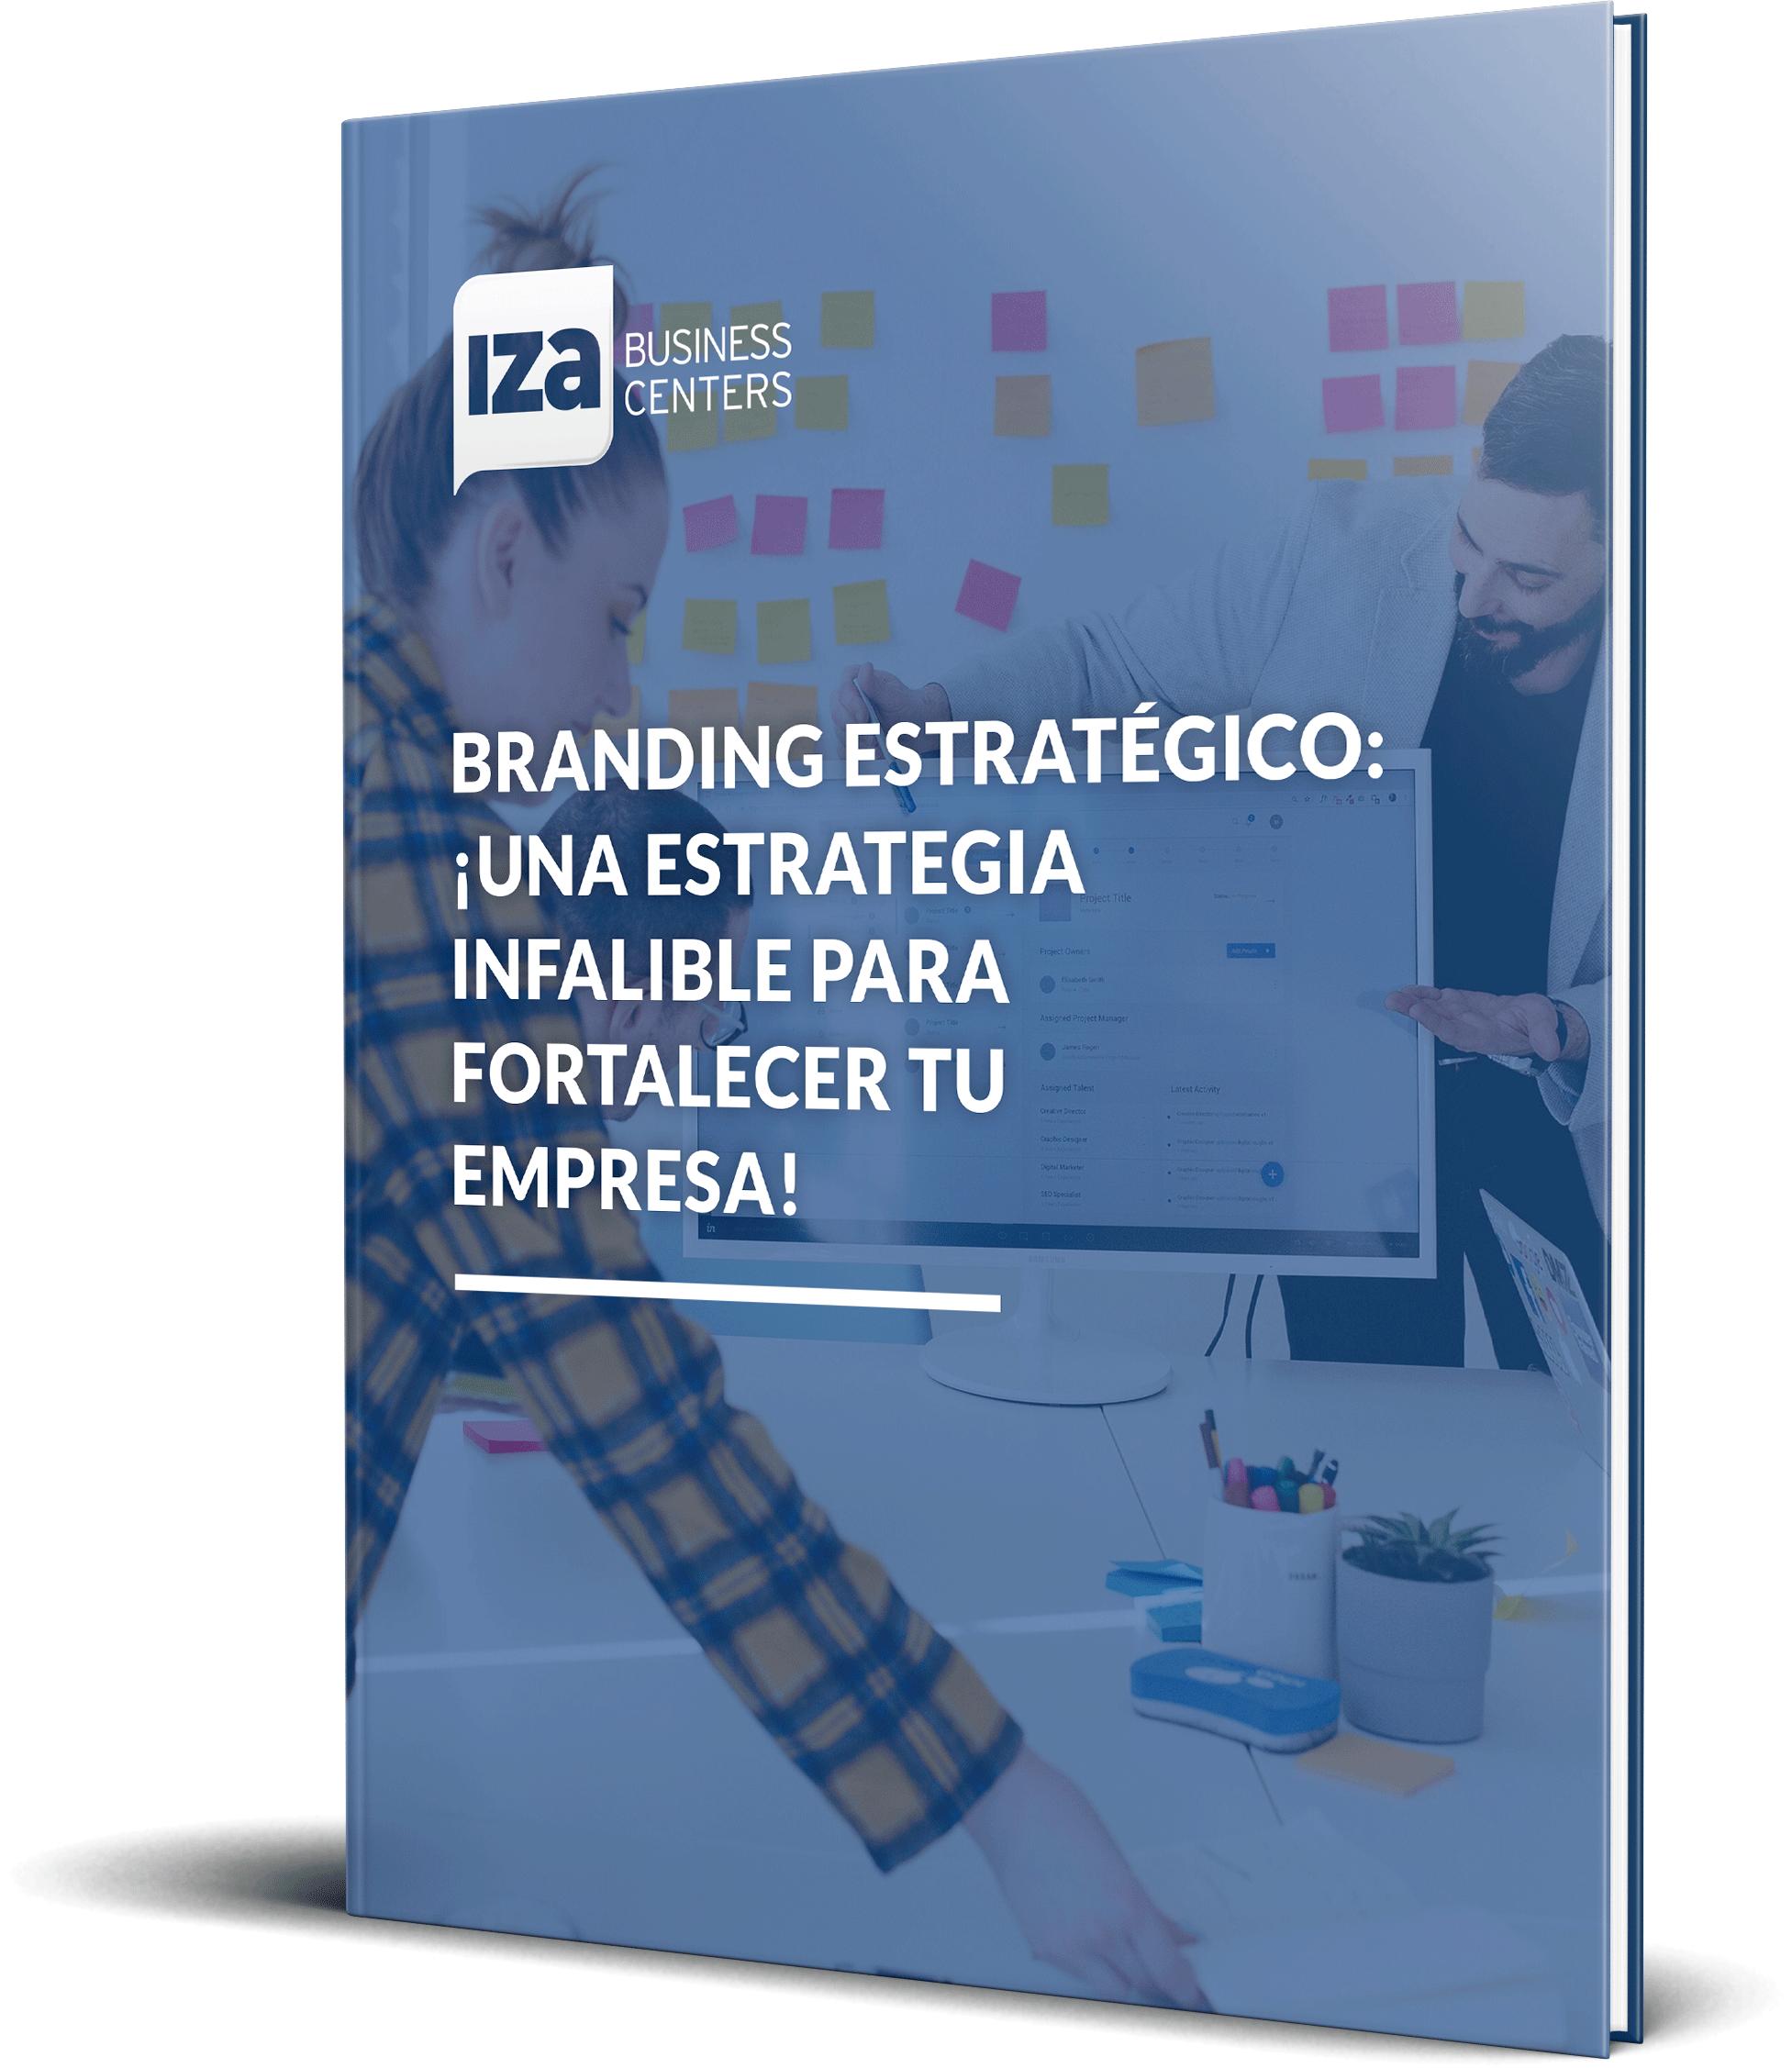 branding-estrategico-para-fortalecer-tu-empresa